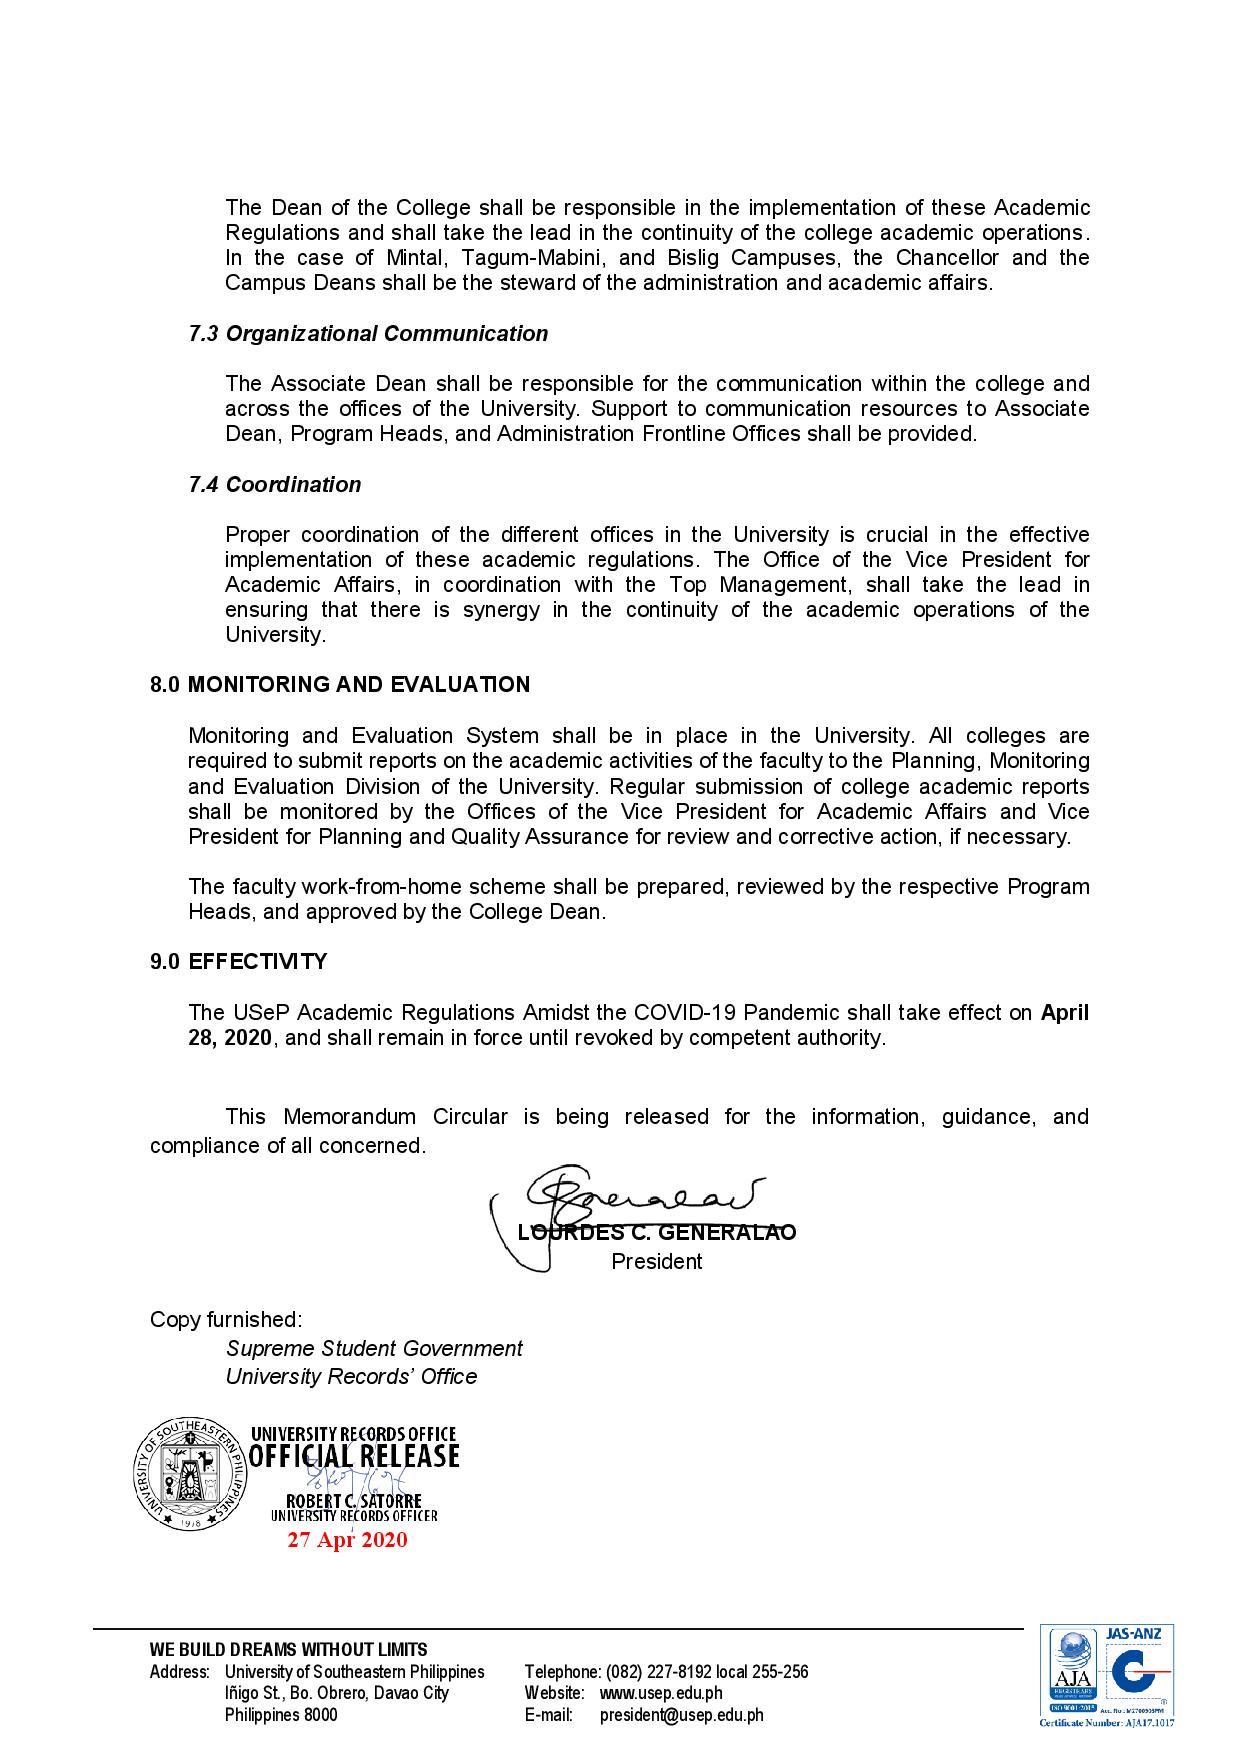 mc-02-s-2020-memorandum-circular-on-usep-academic-regulations-amidst-the-covid-19-pandemic-page-009